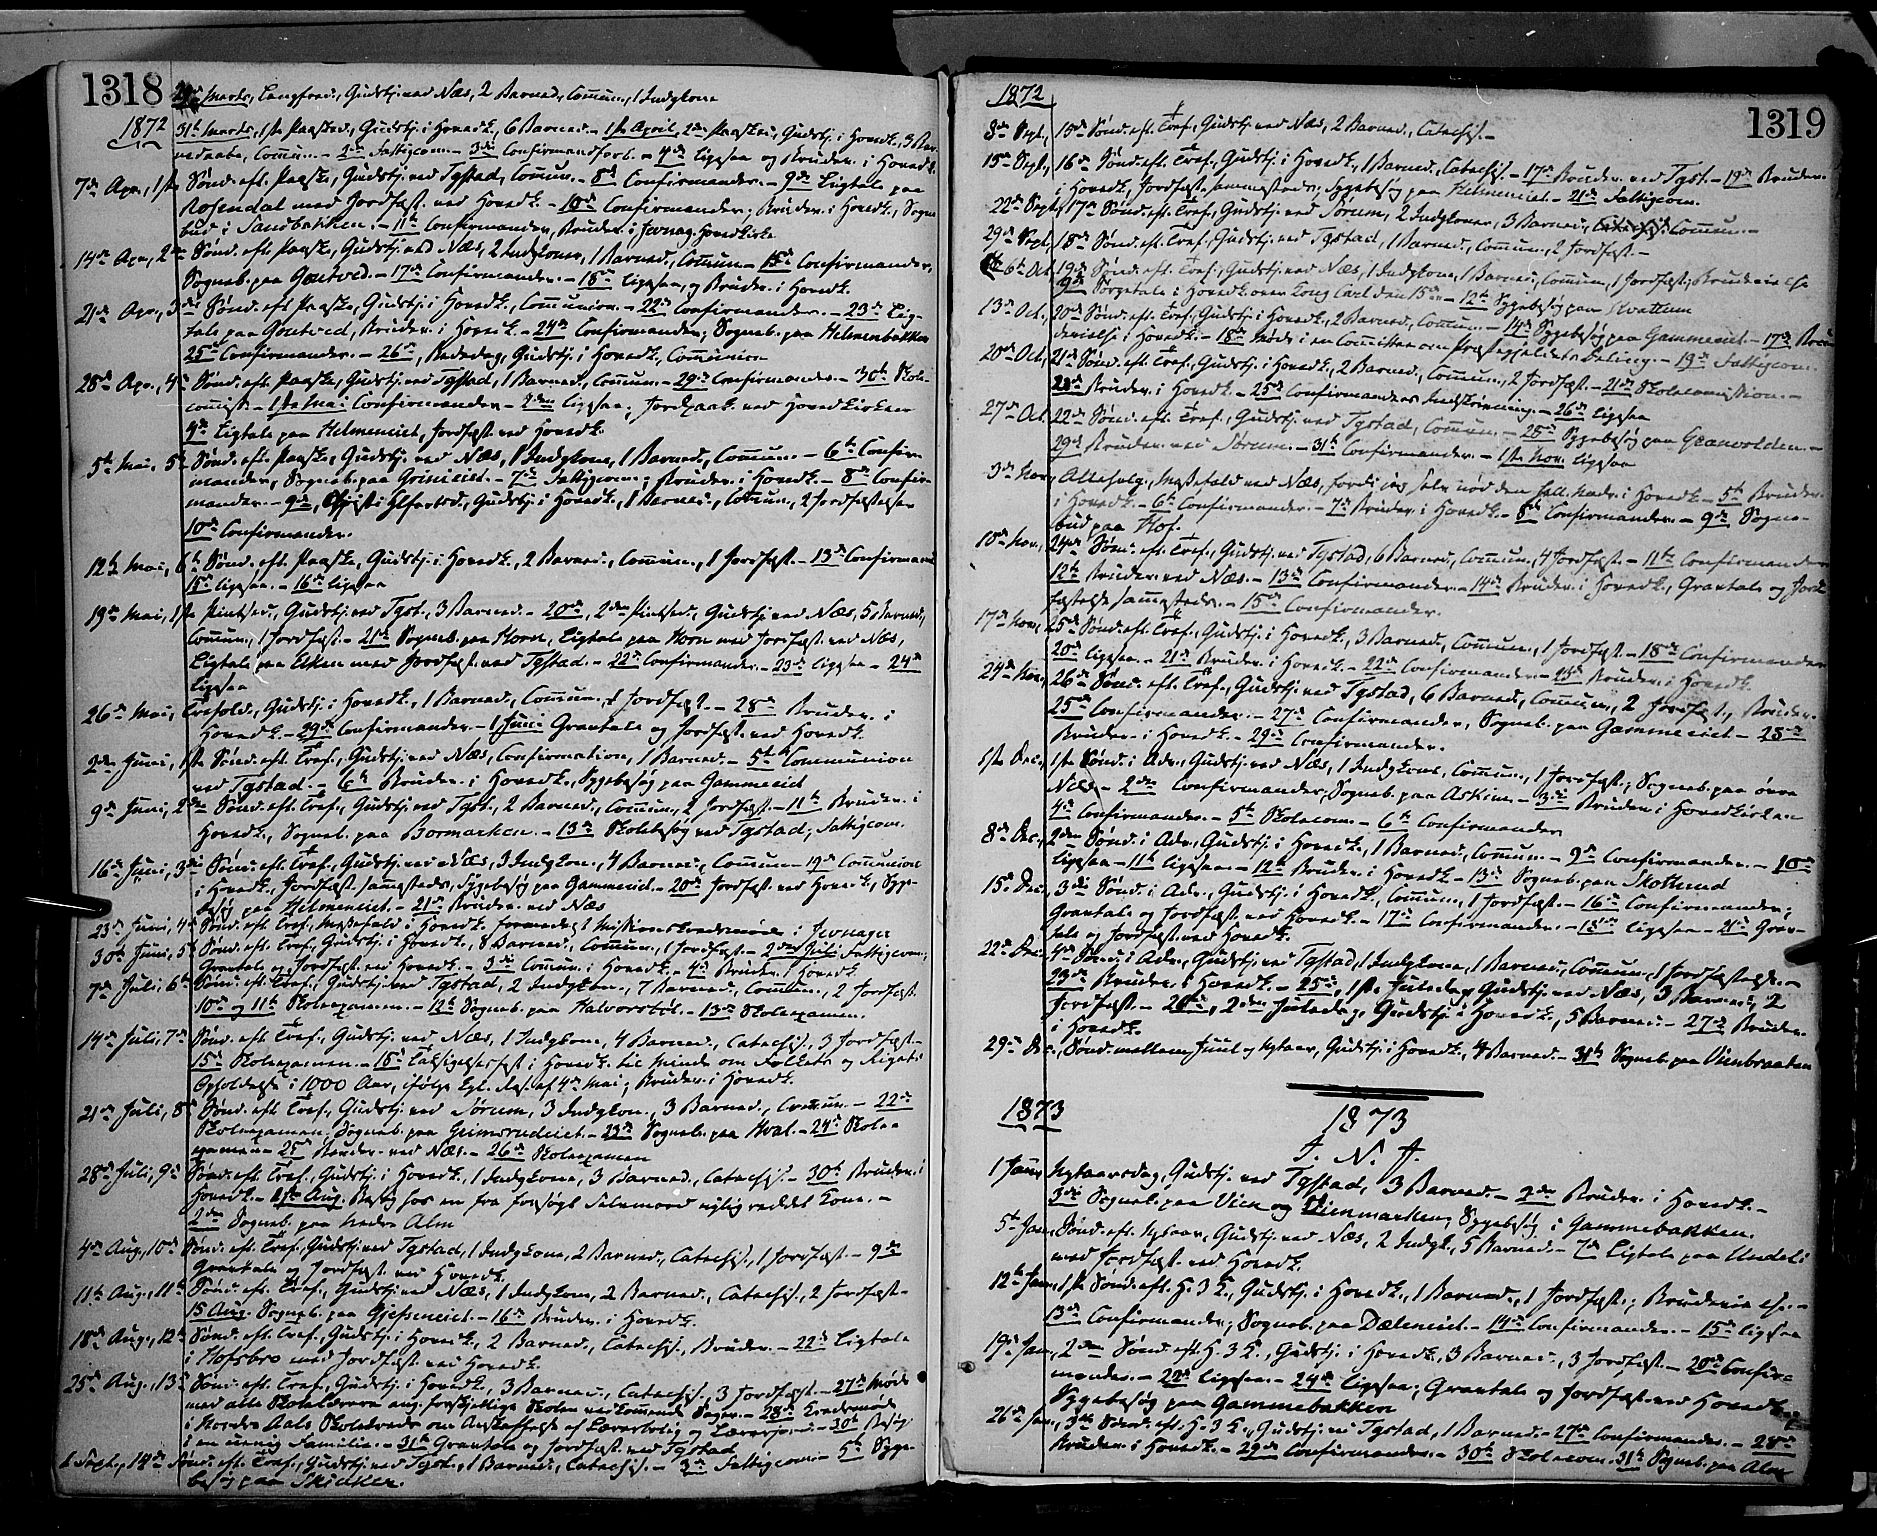 SAH, Gran prestekontor, Ministerialbok nr. 12, 1856-1874, s. 1318-1319